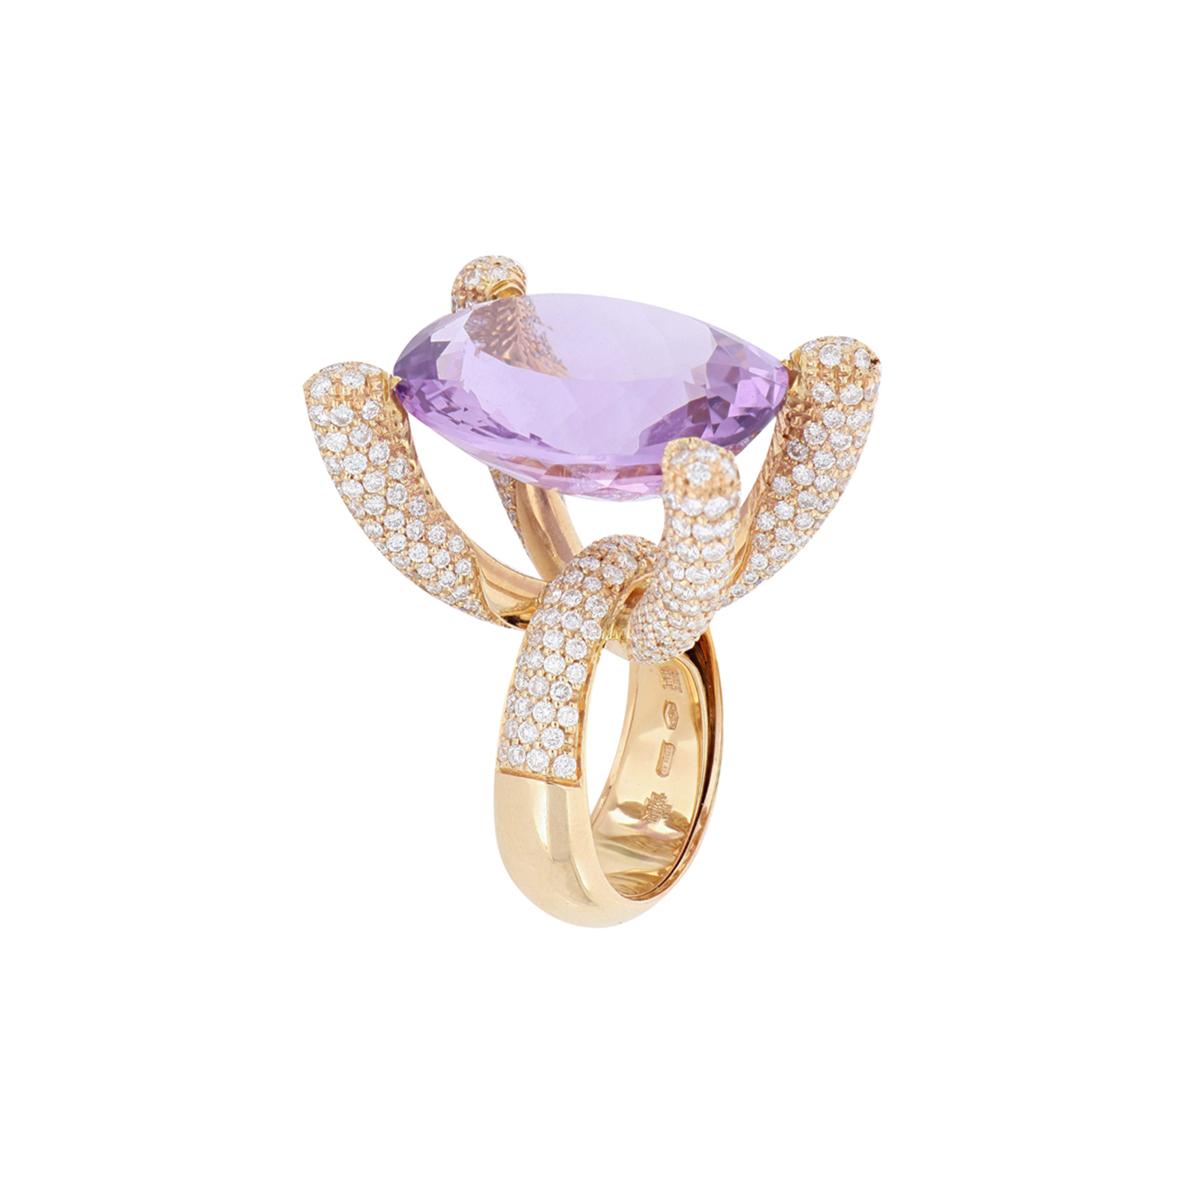 Diamond-Prong Amethyst Ring